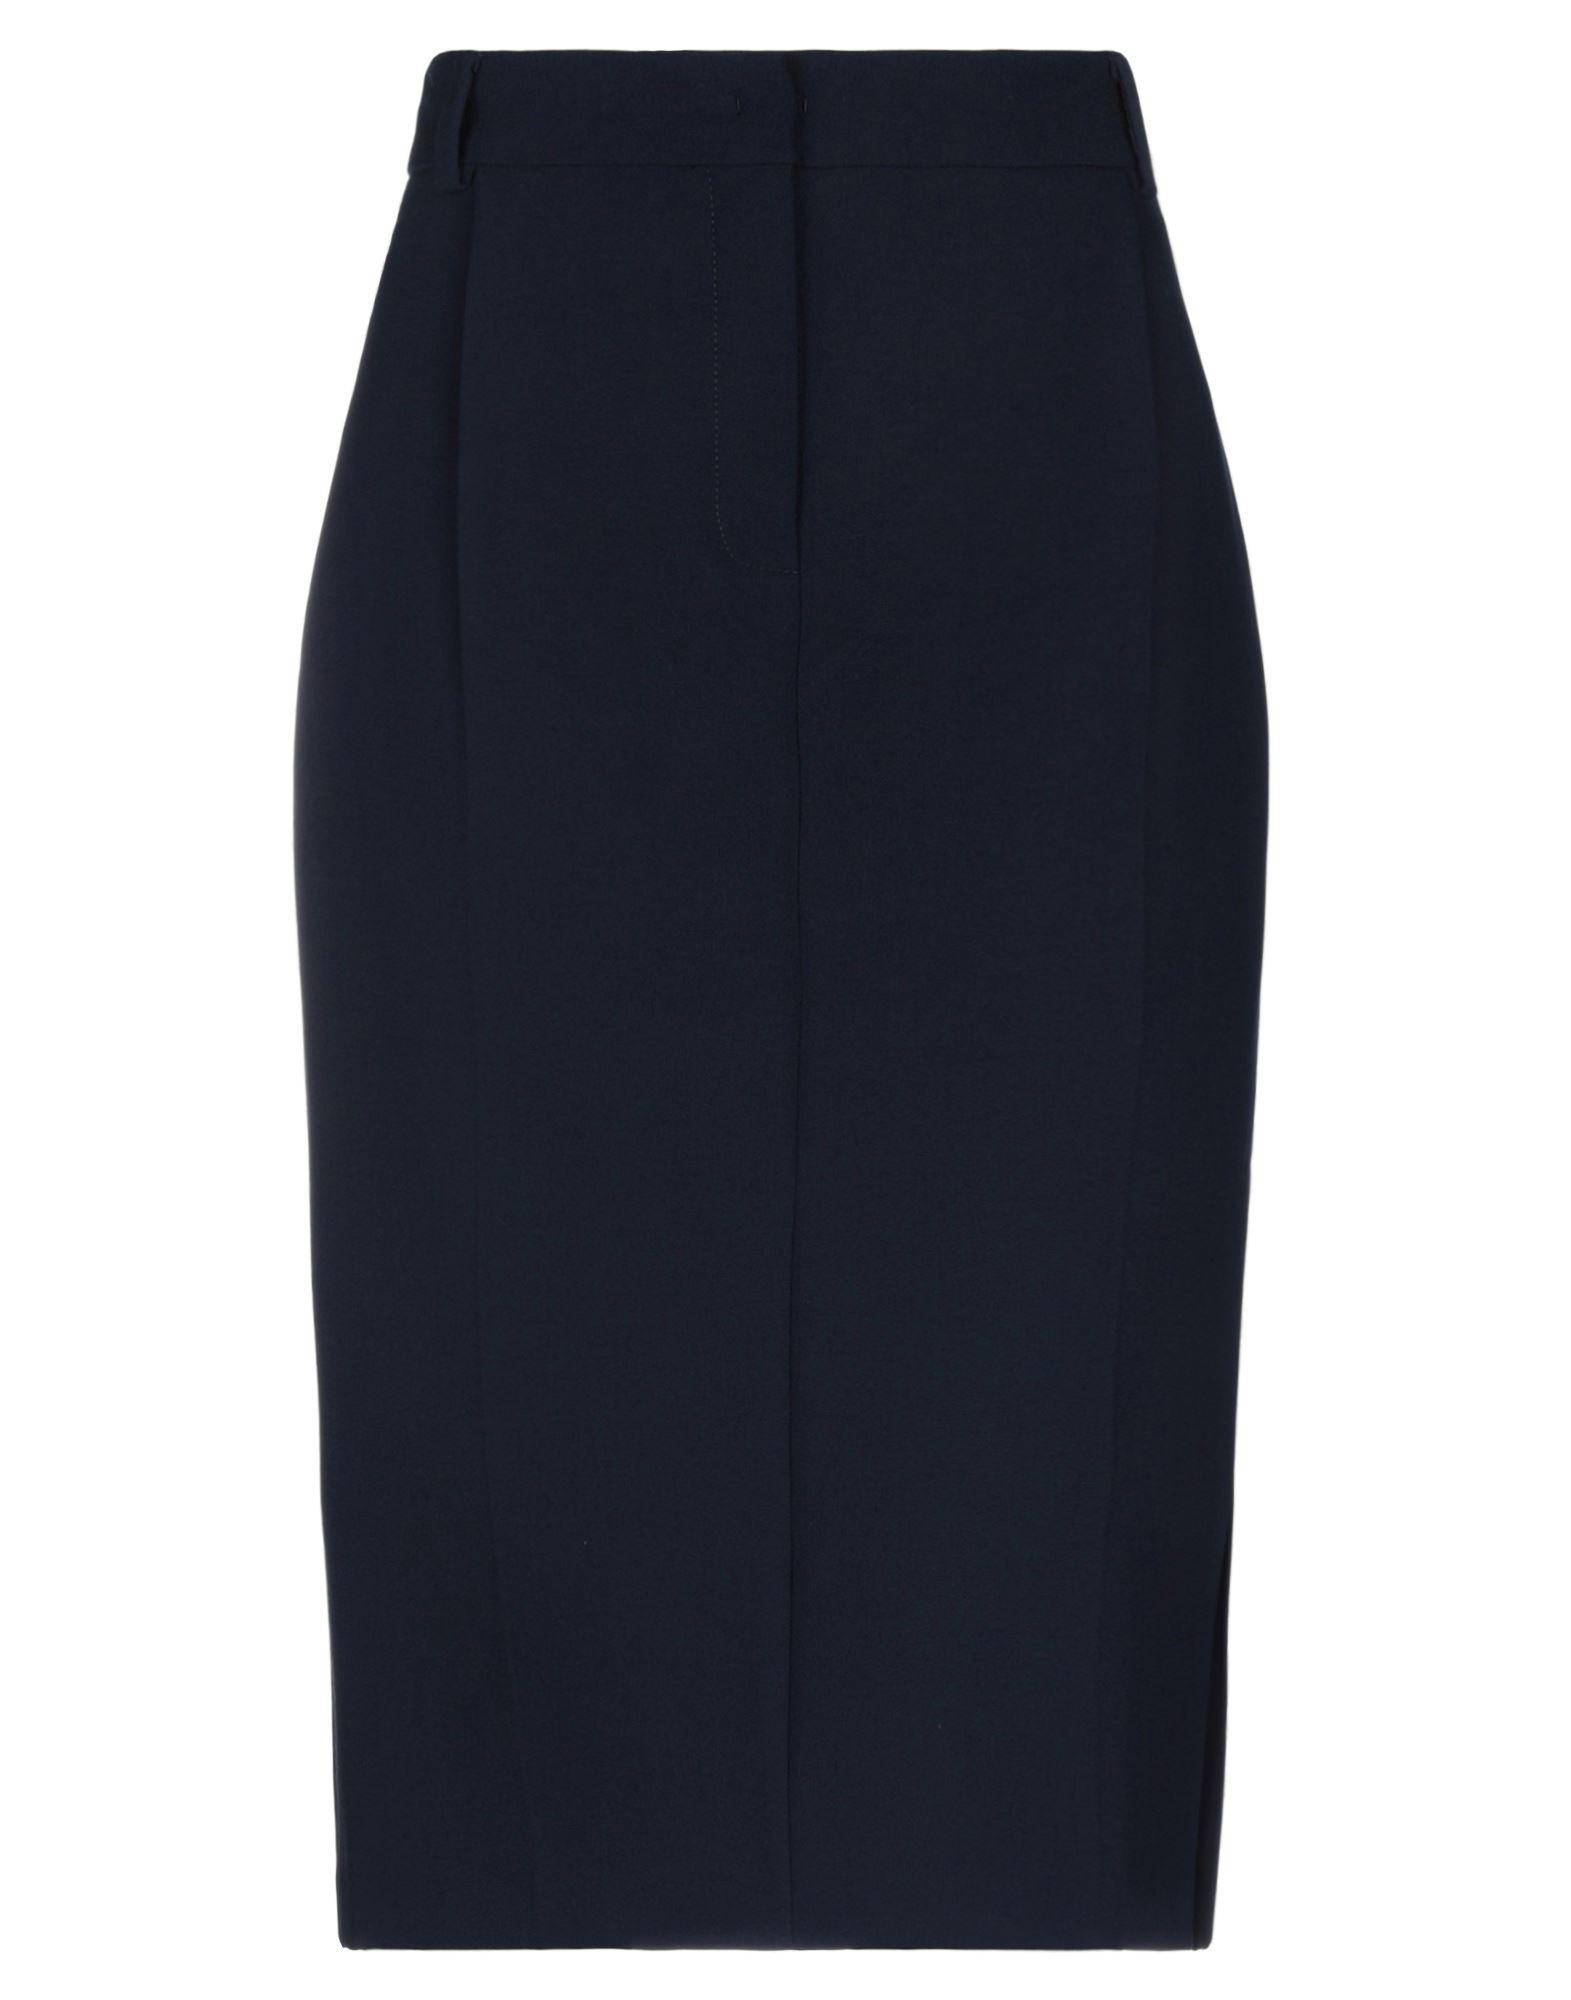 MAX & CO. Юбка длиной 3/4 co go юбка длиной 3 4